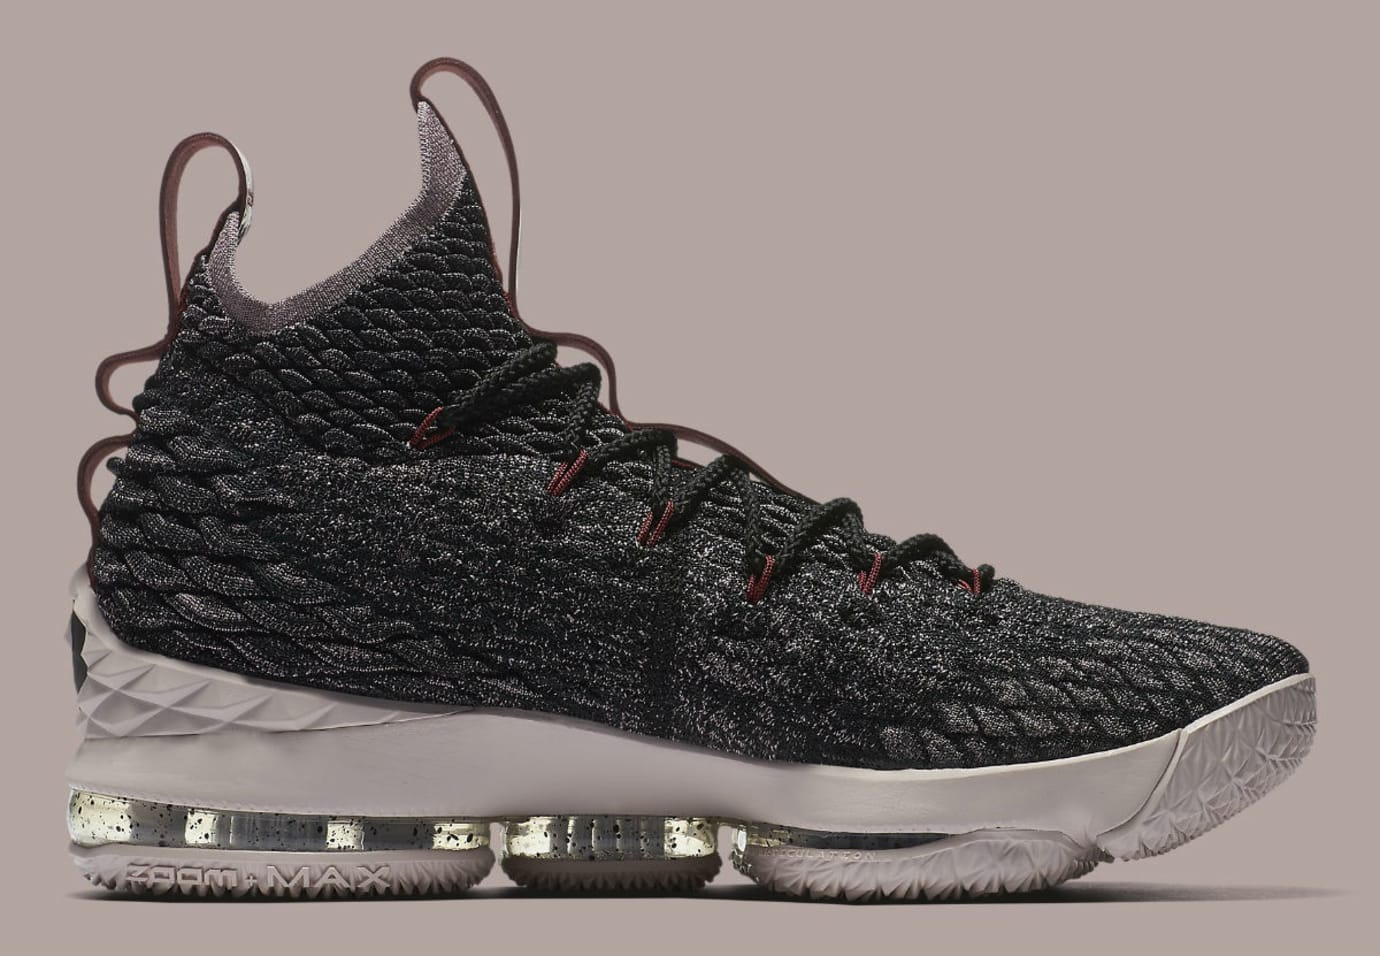 ab00ef7e407cb Nike LeBron 15 Pride of Ohio Release date 897648-003 Medial